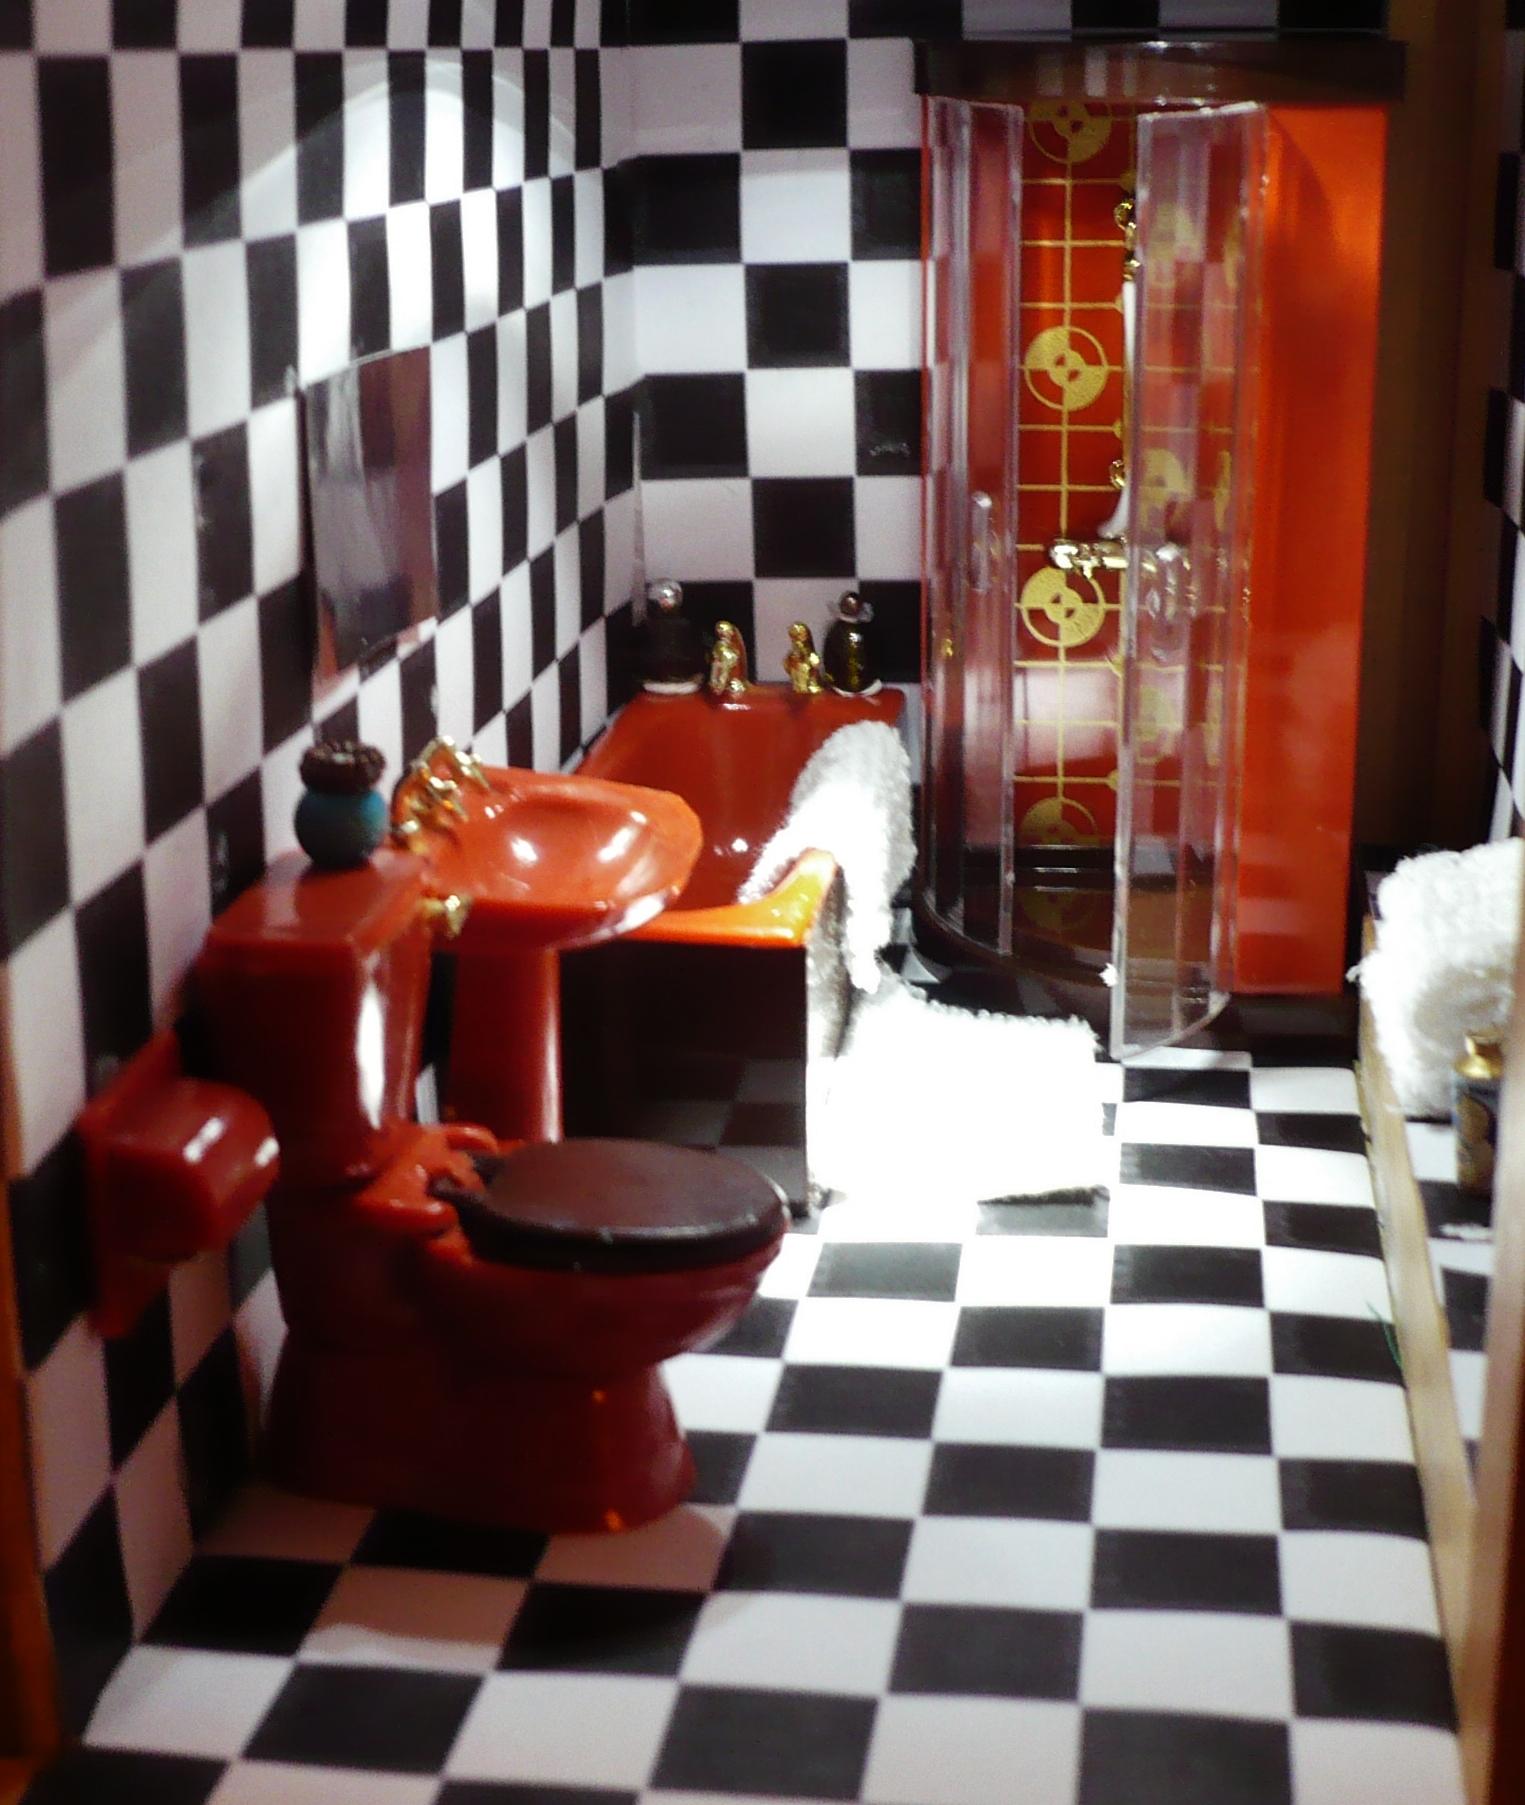 Shower room now has a bath